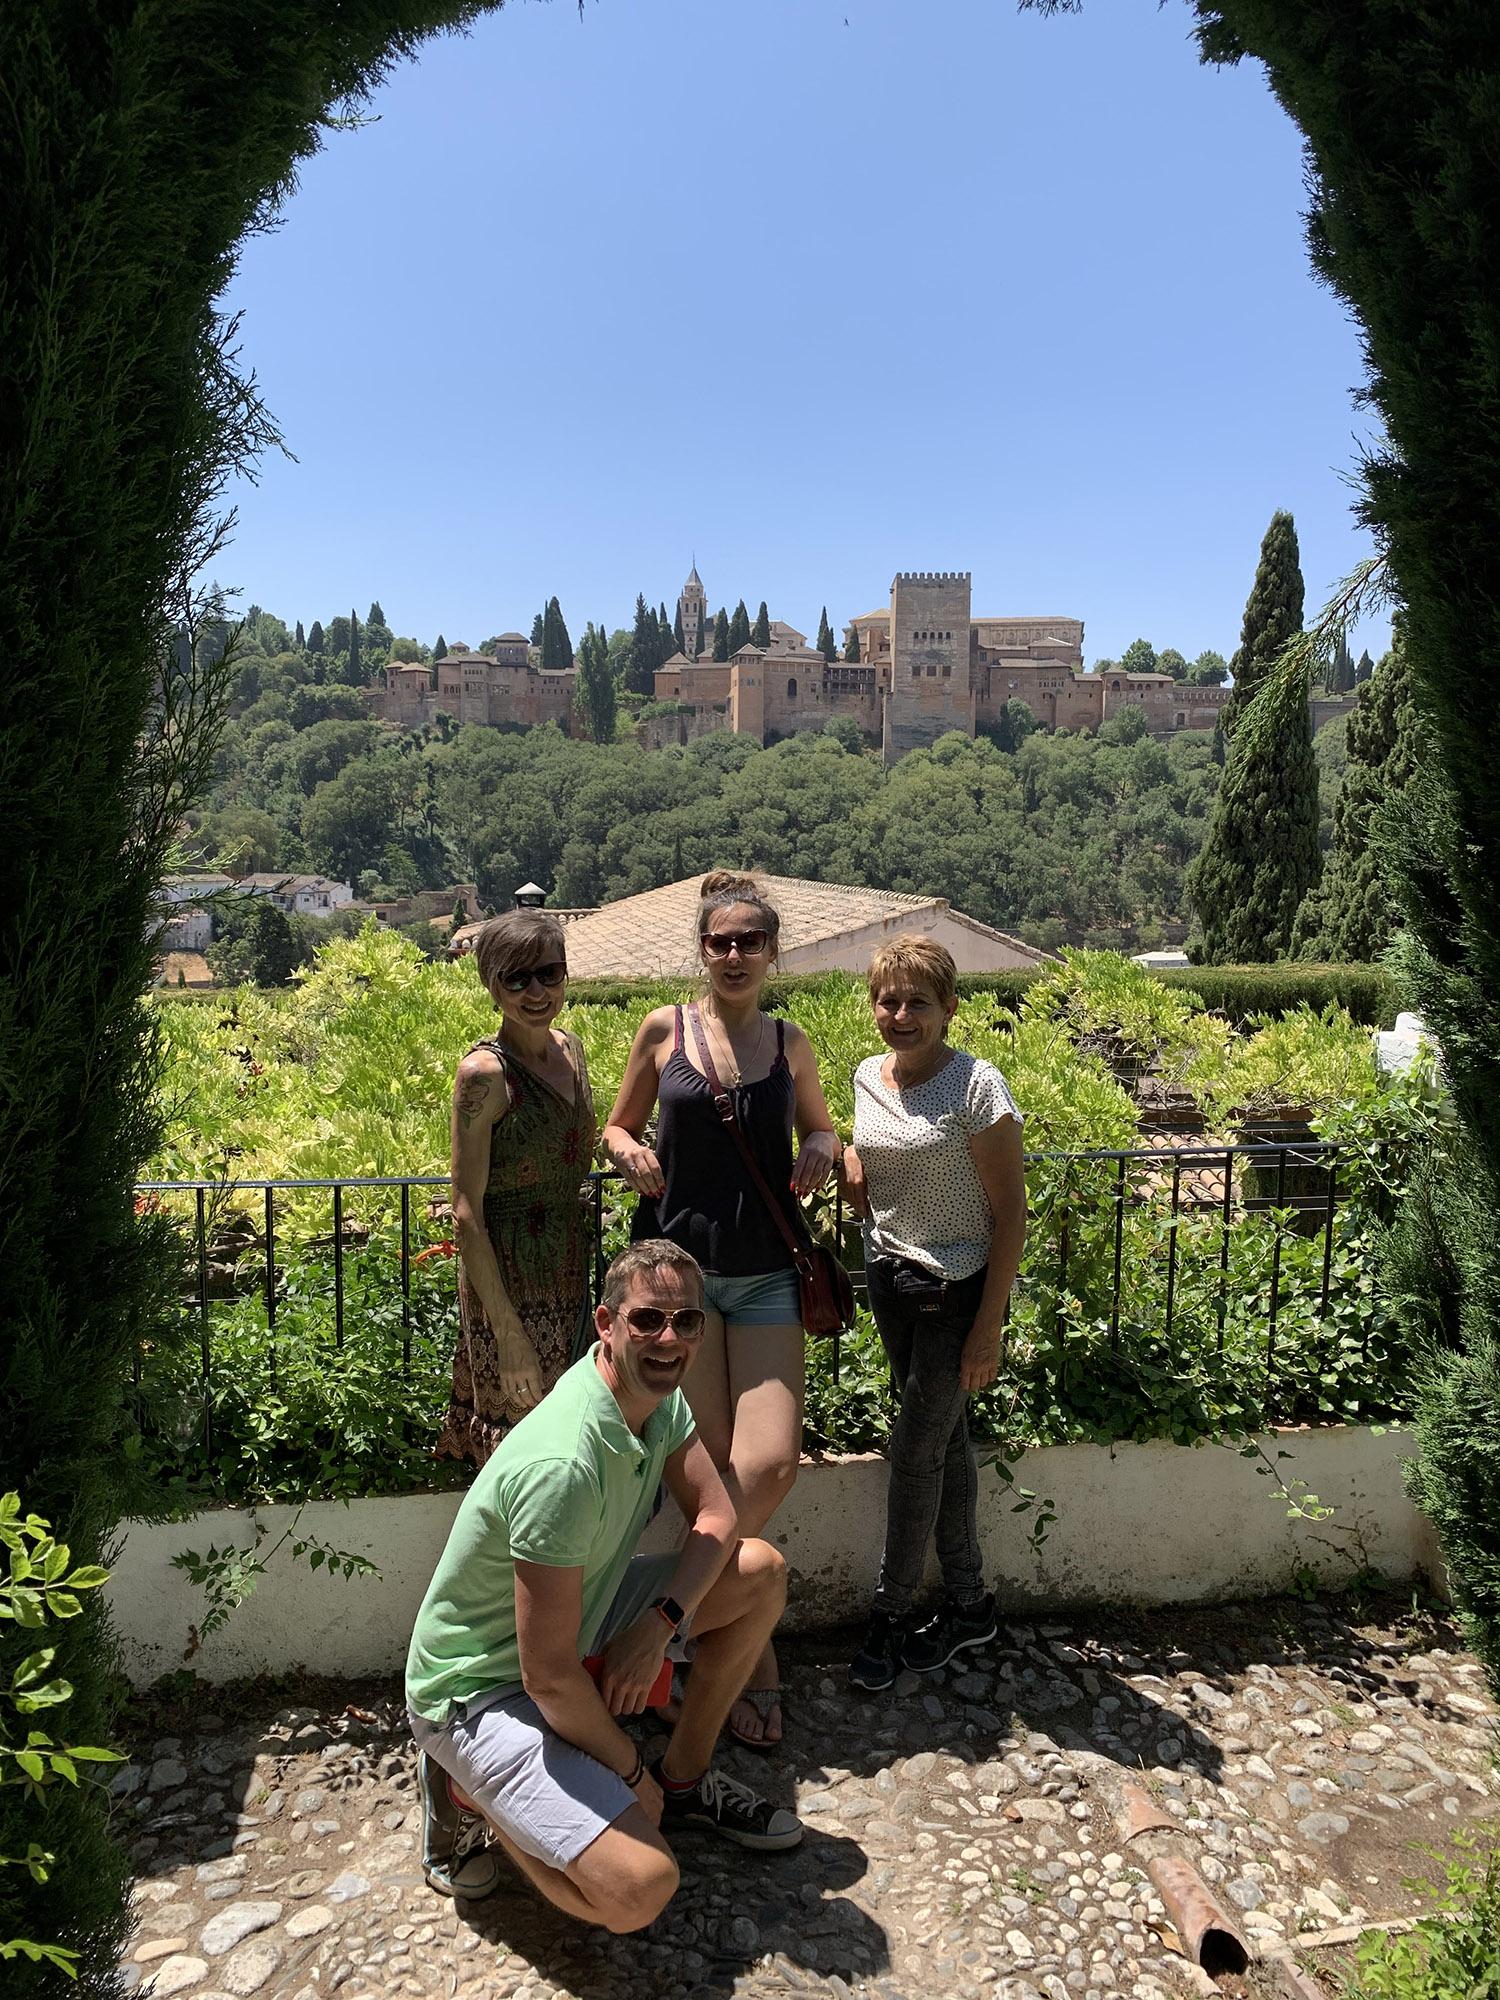 The Alhambra from a secret garden in Sacramonte